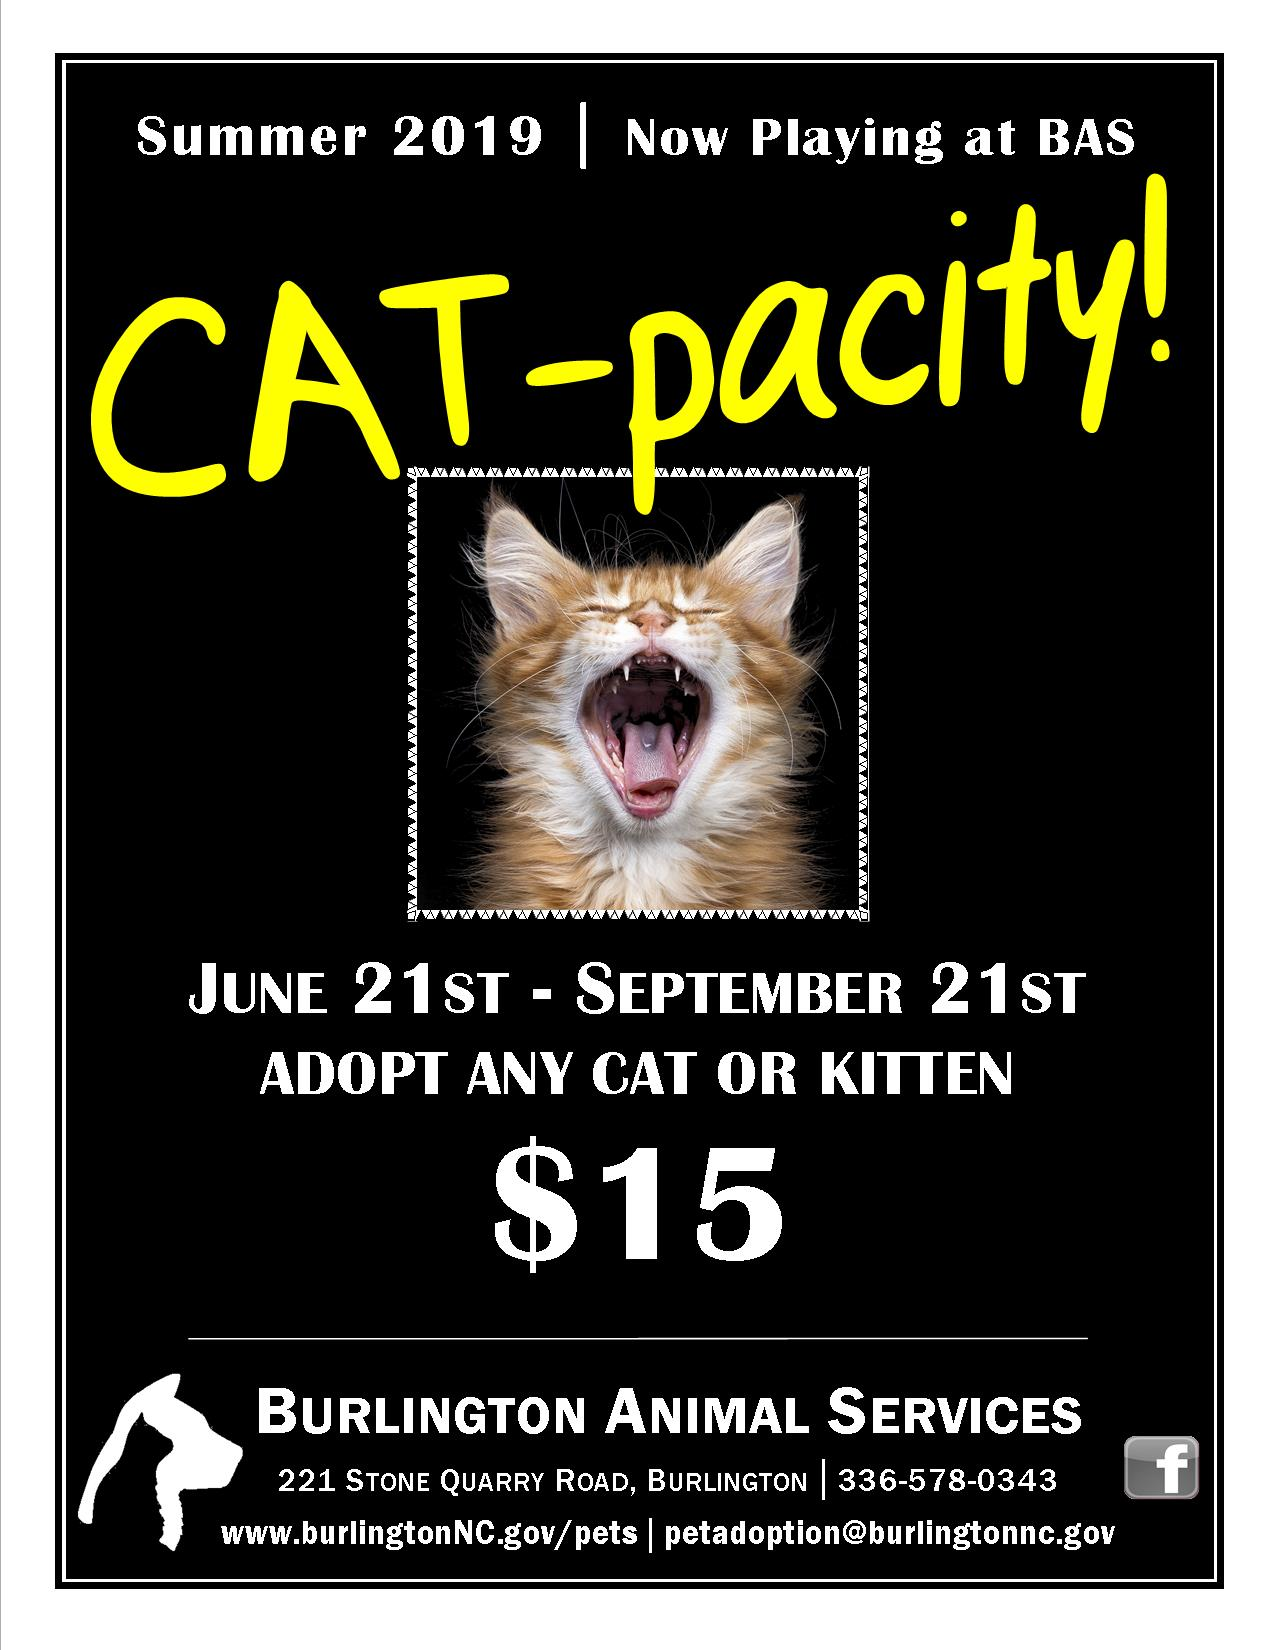 Burlington Animal Services 221 Stone Quarry Rd  Burlington